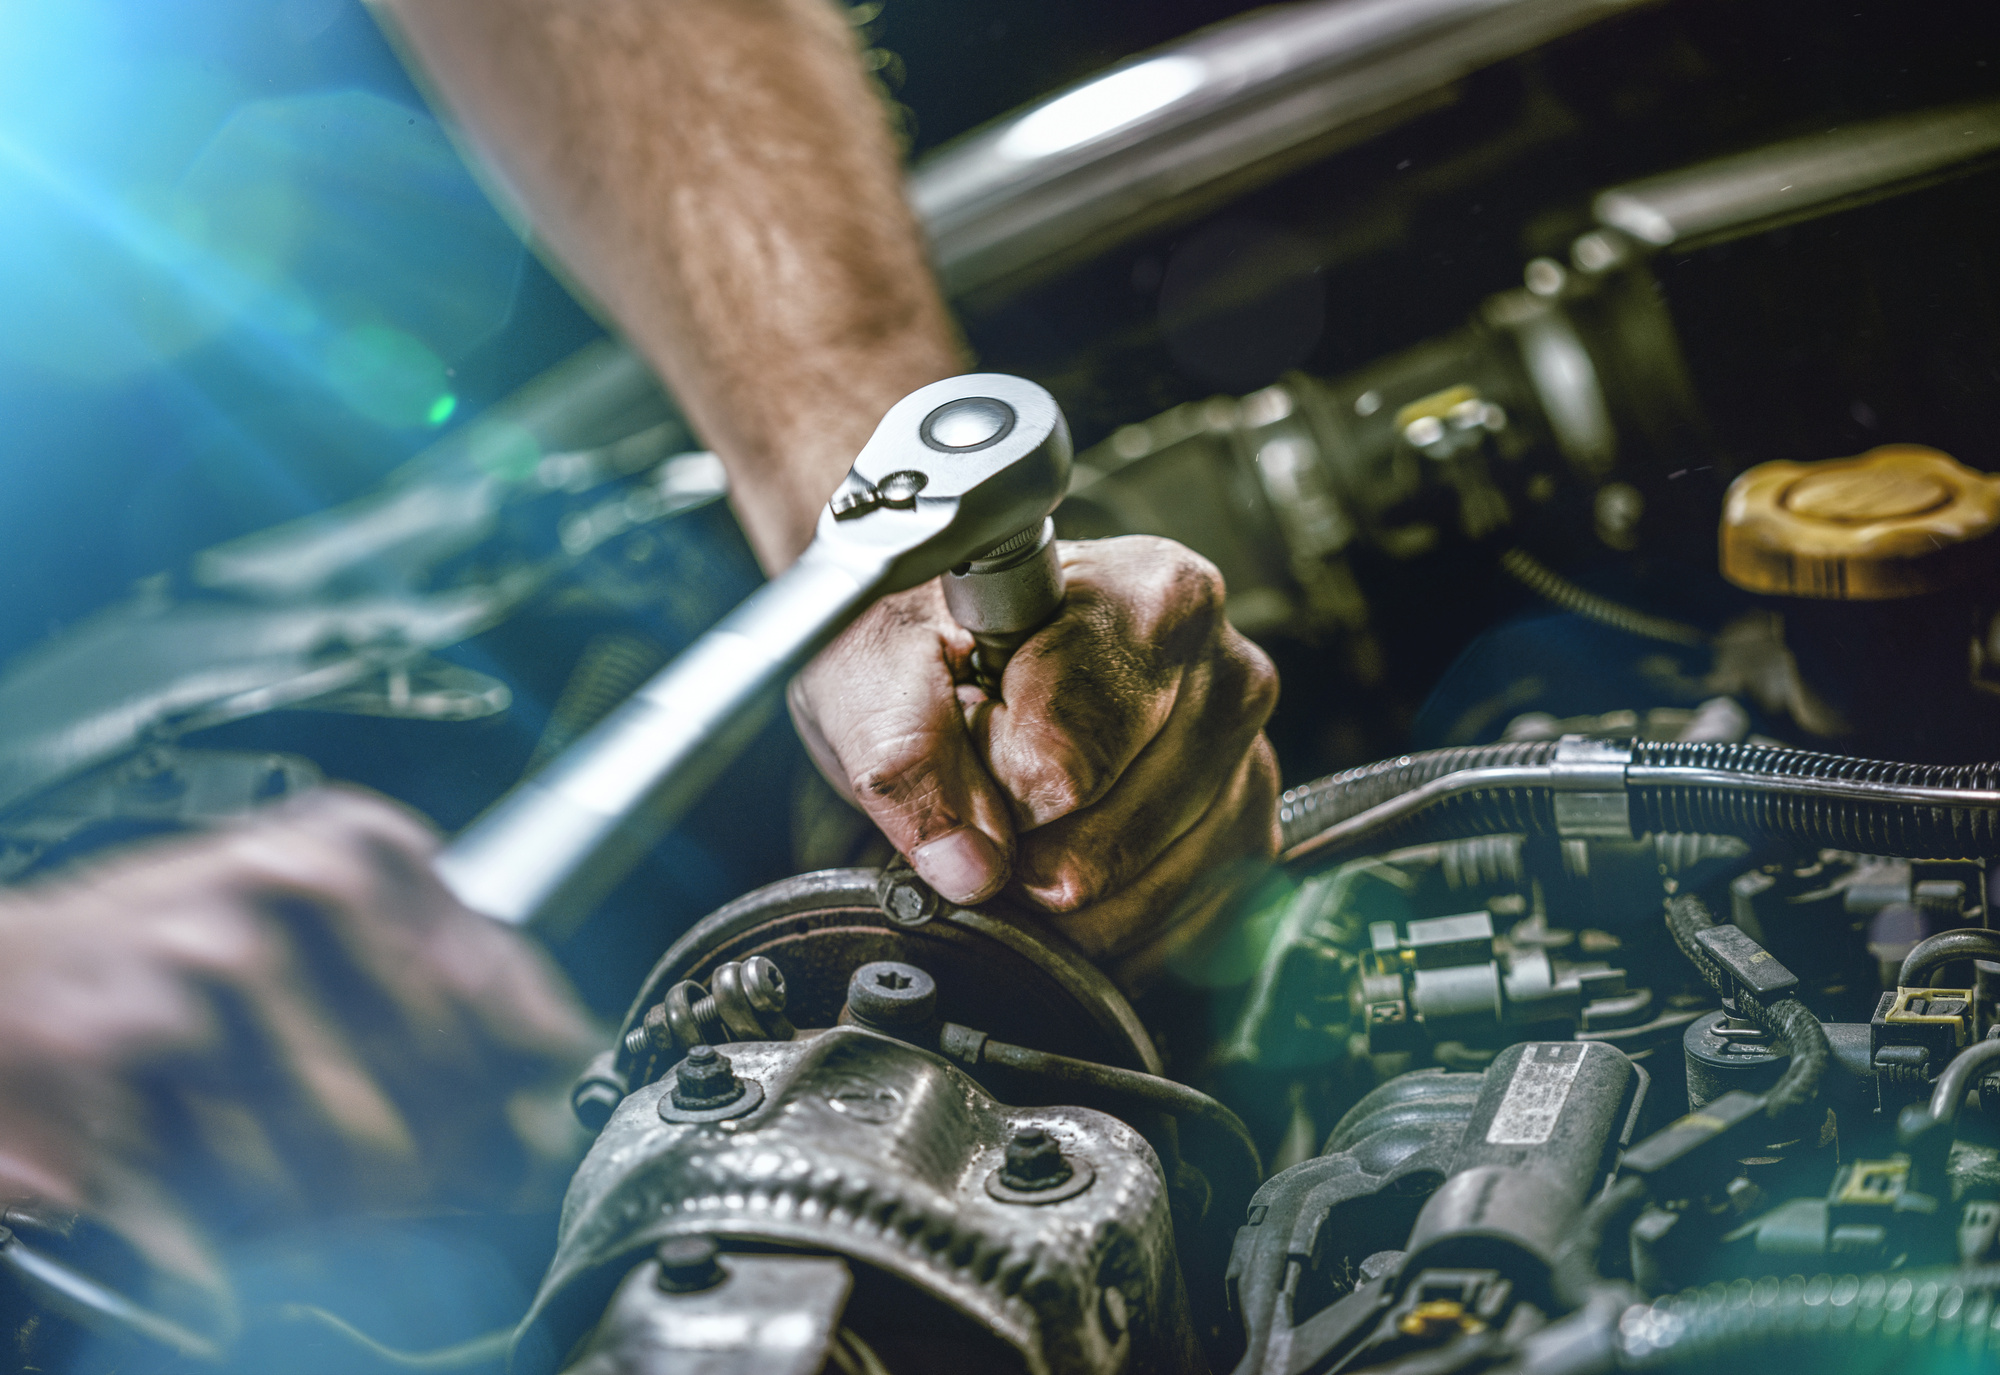 Mechanic Doing Engine Works on a Car